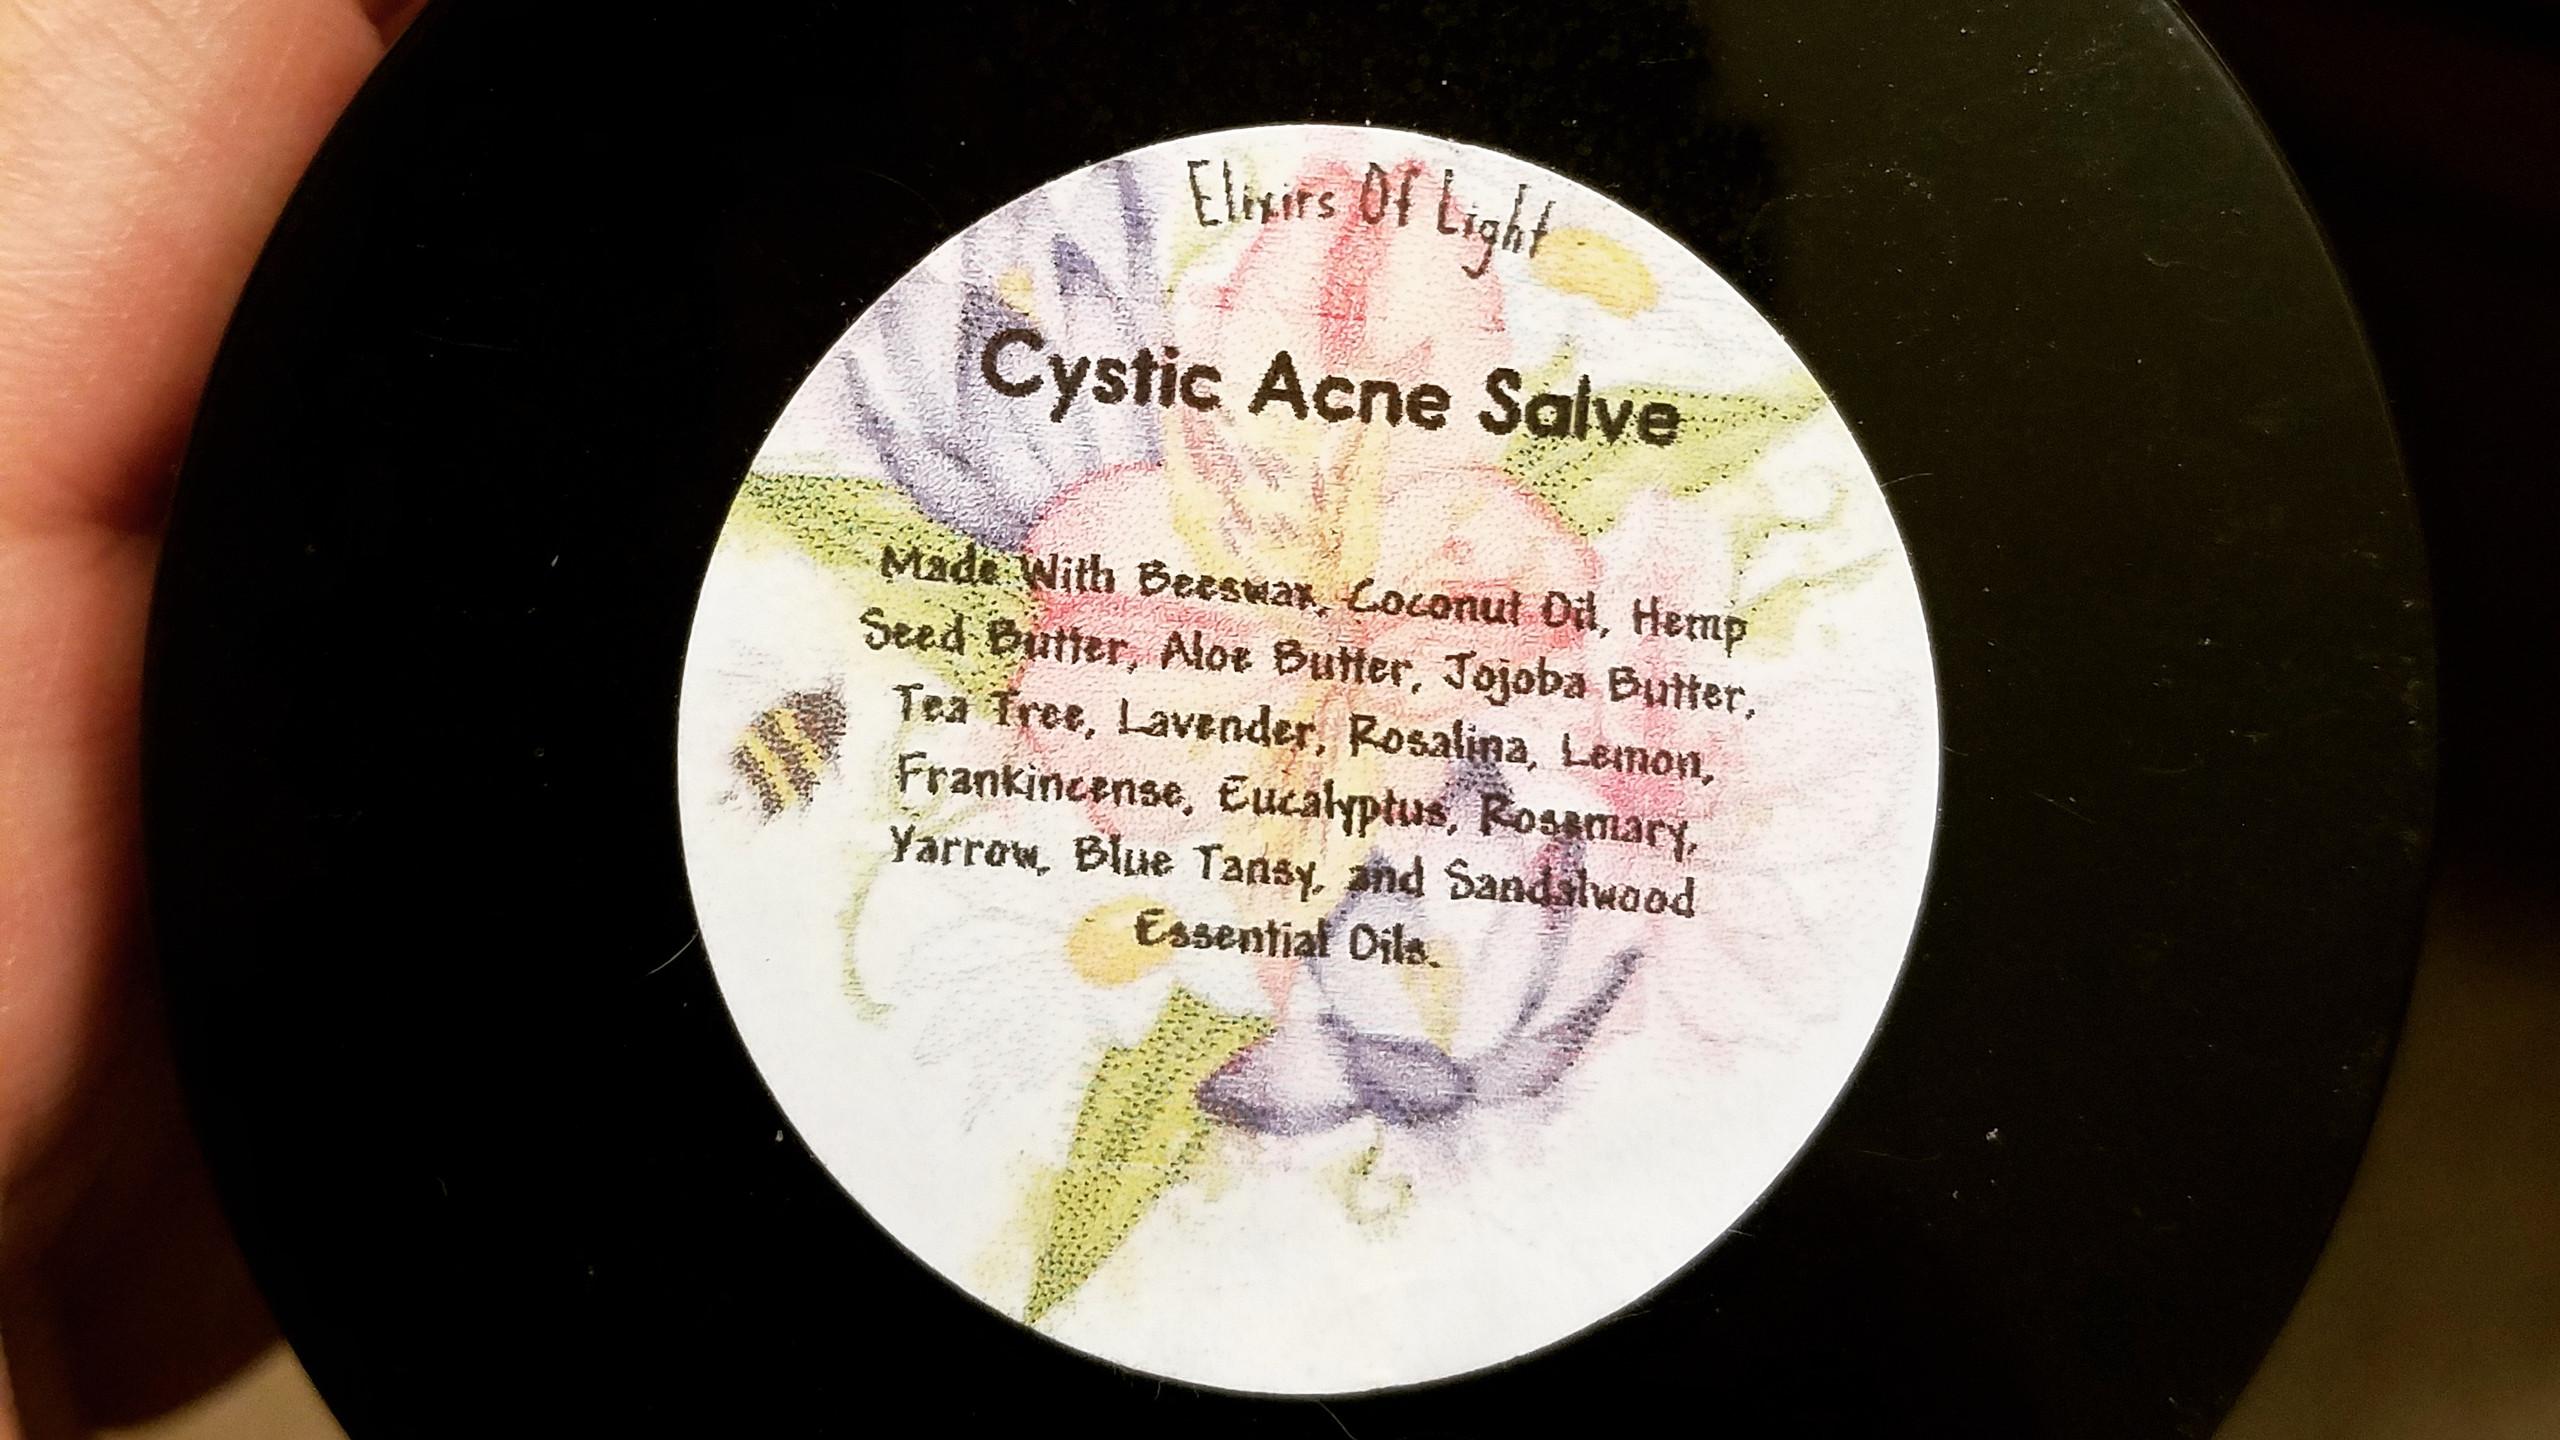 Cystic Acne Salve